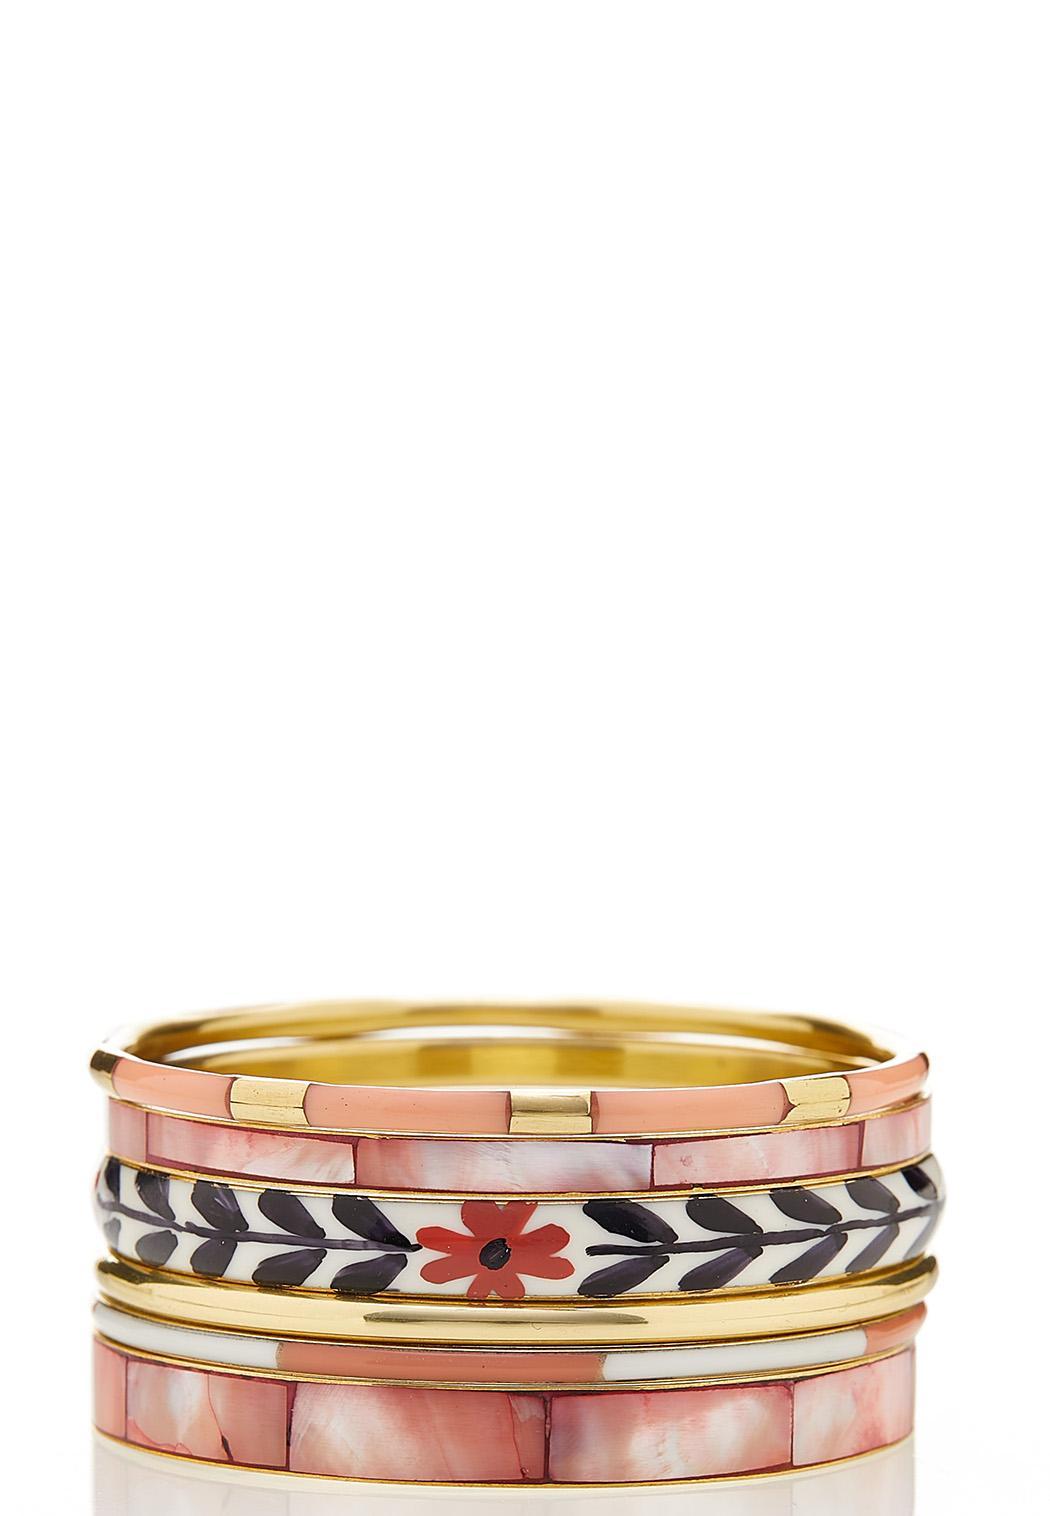 Coordinated Bangle Bracelet Set